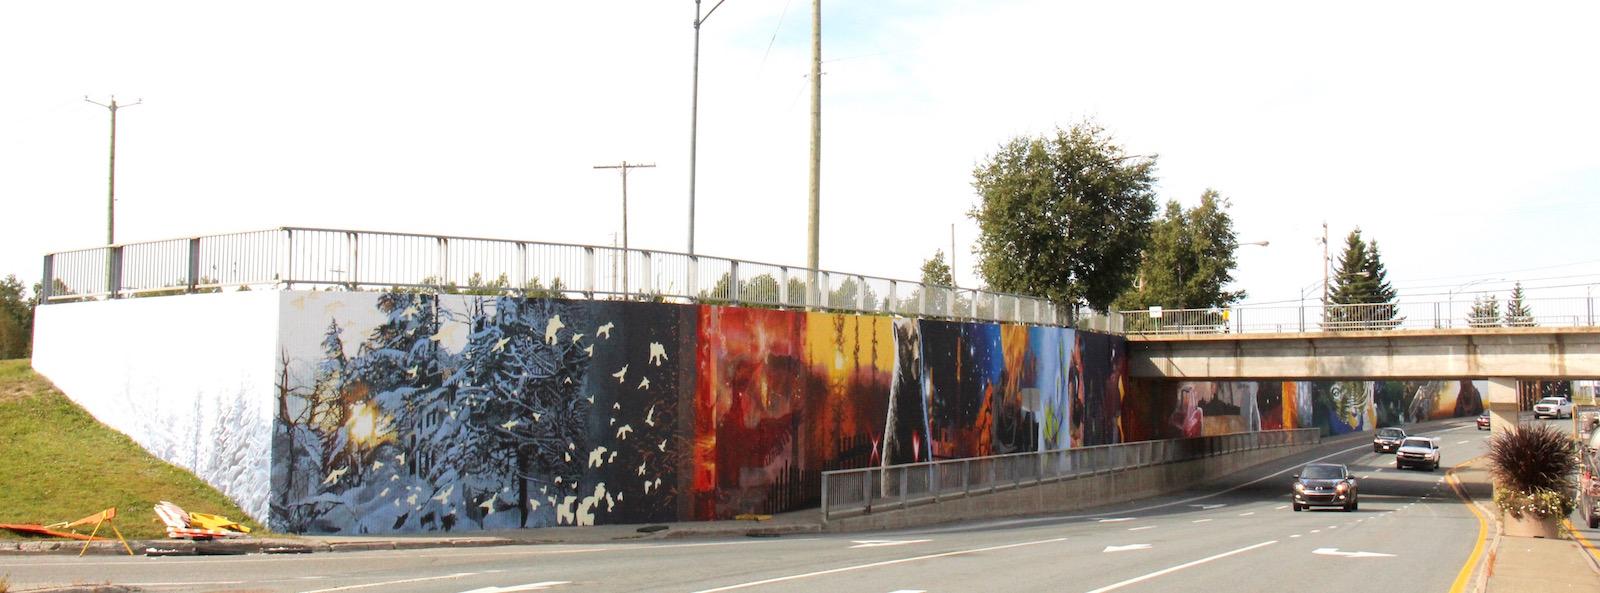 murale art public Abitibi-Témiscamingue Desjardins